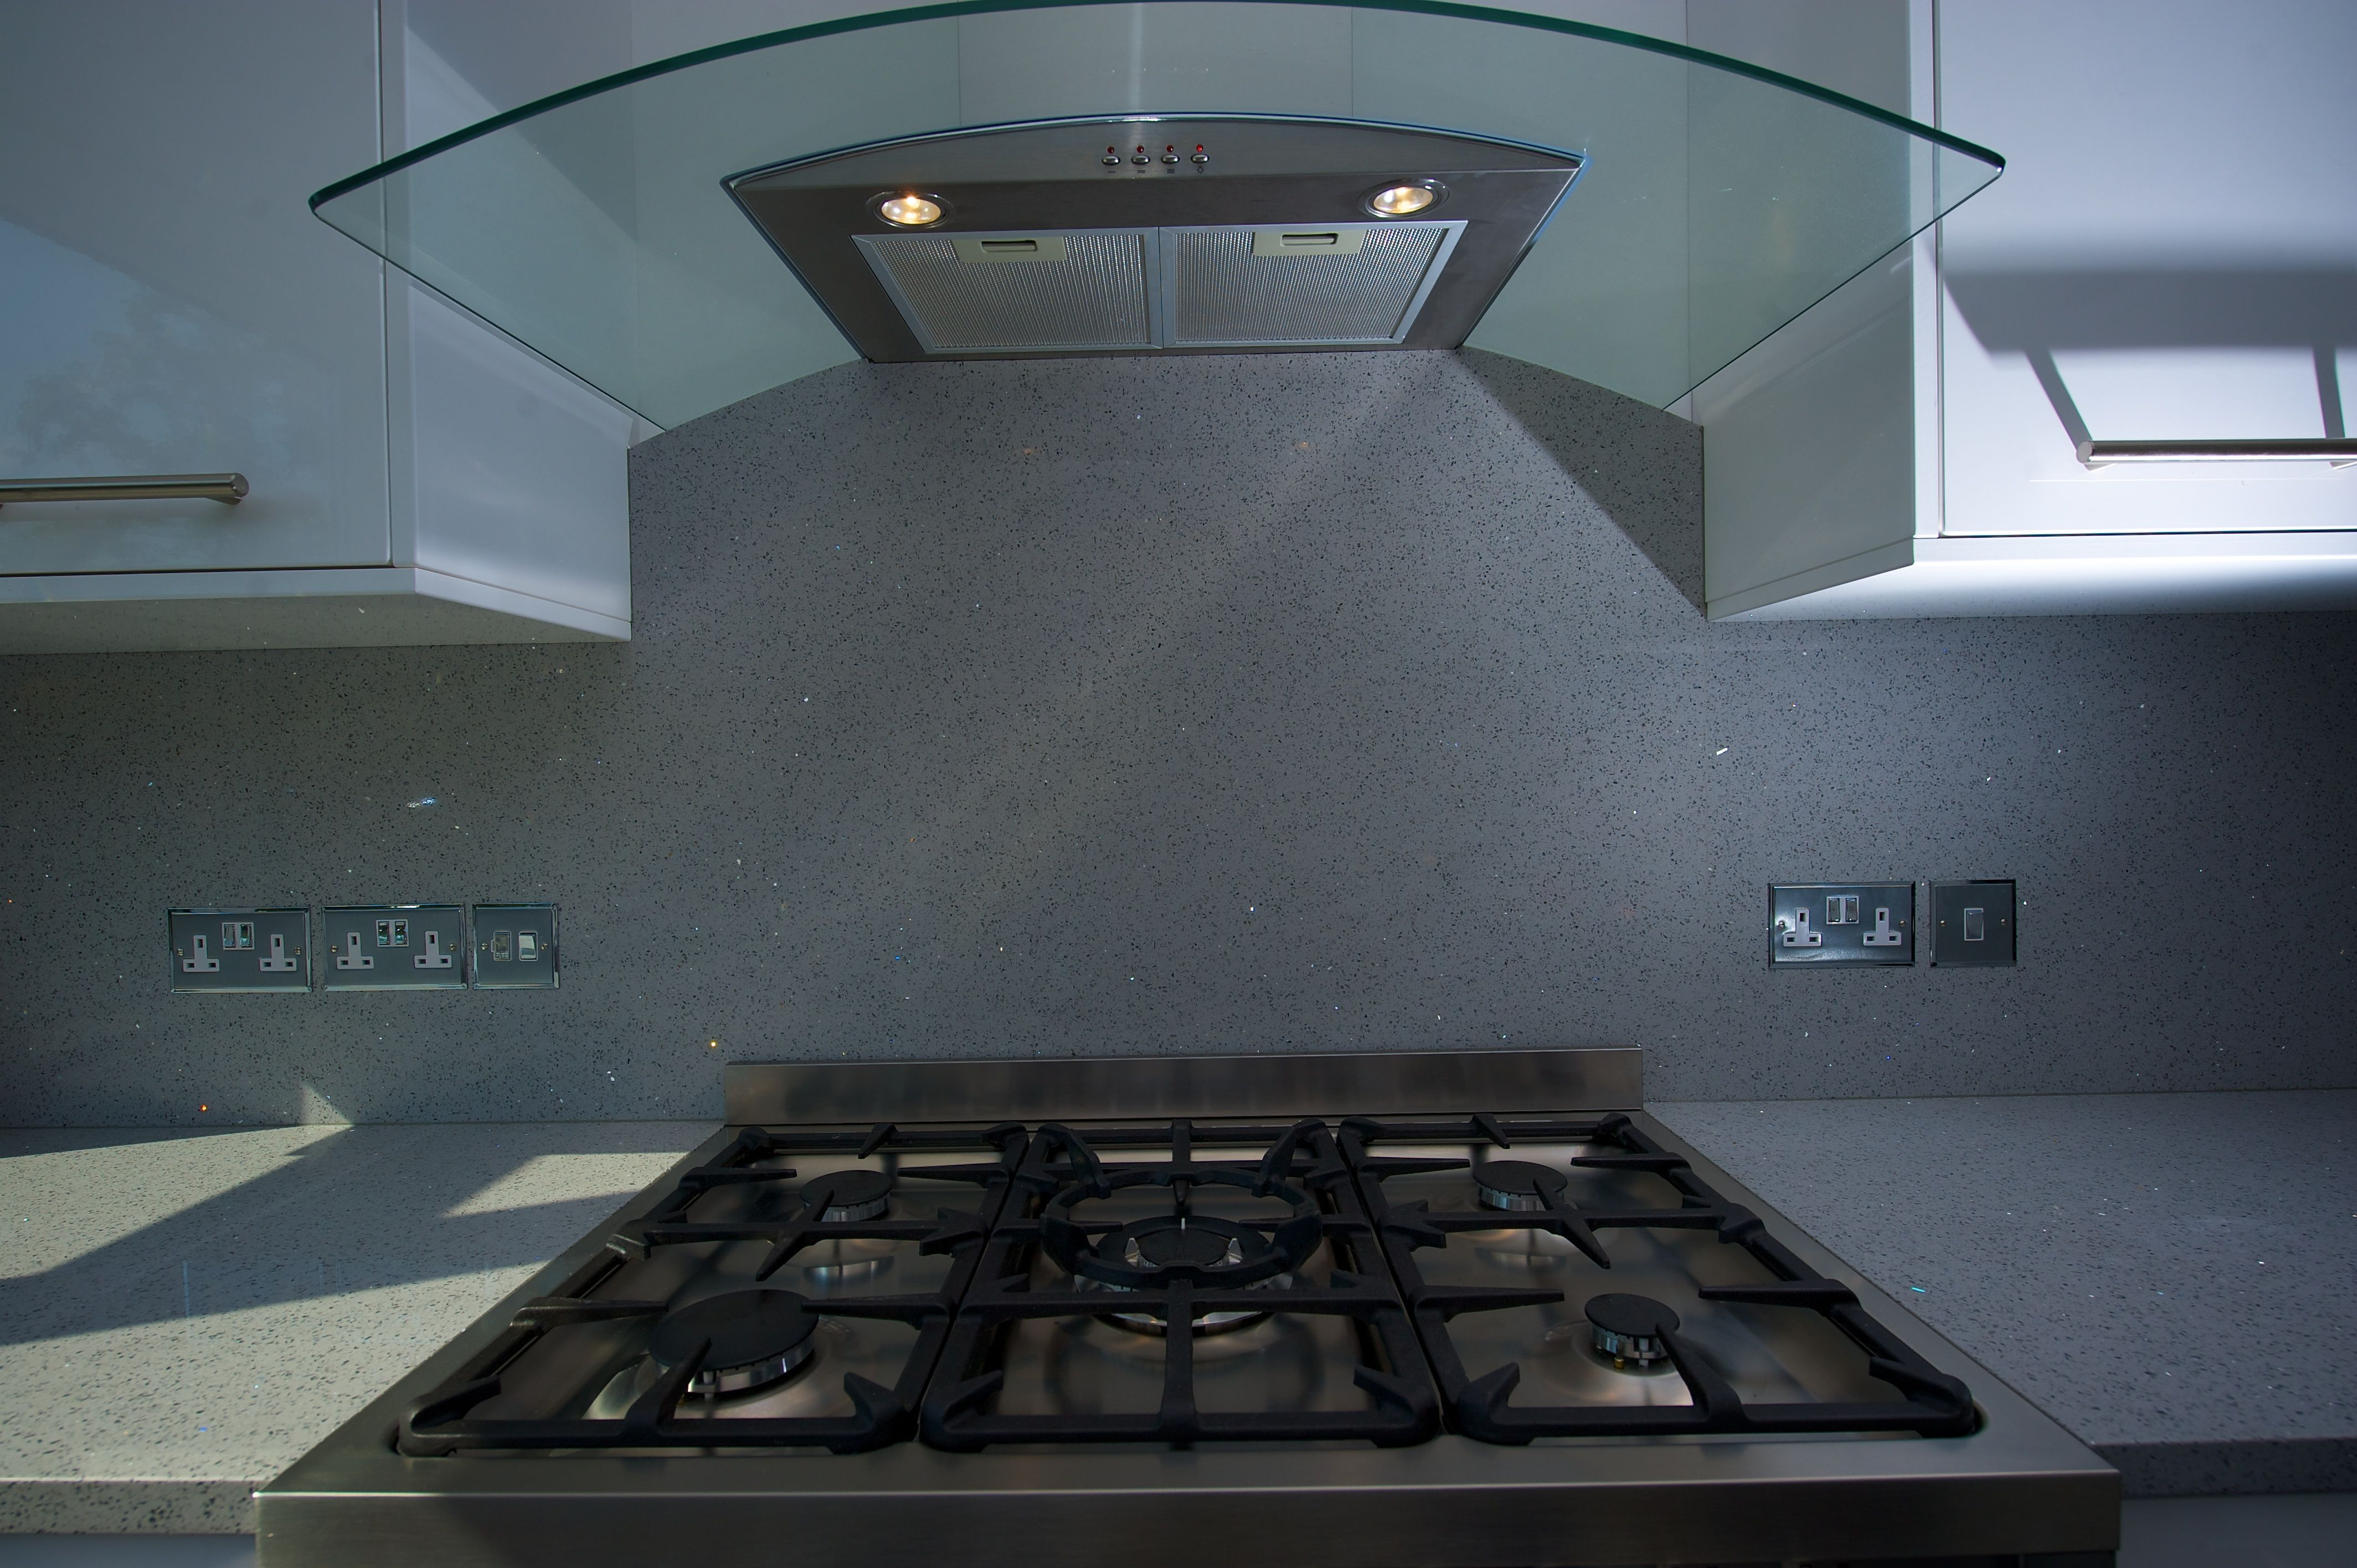 Silestone Chrome Worktops And Splashback By The Marble Store This Stunning Grey Sparkly Quartz By Silestone Has Ba Kitchen Worktops Uk Kitchen Worktop Kitchen